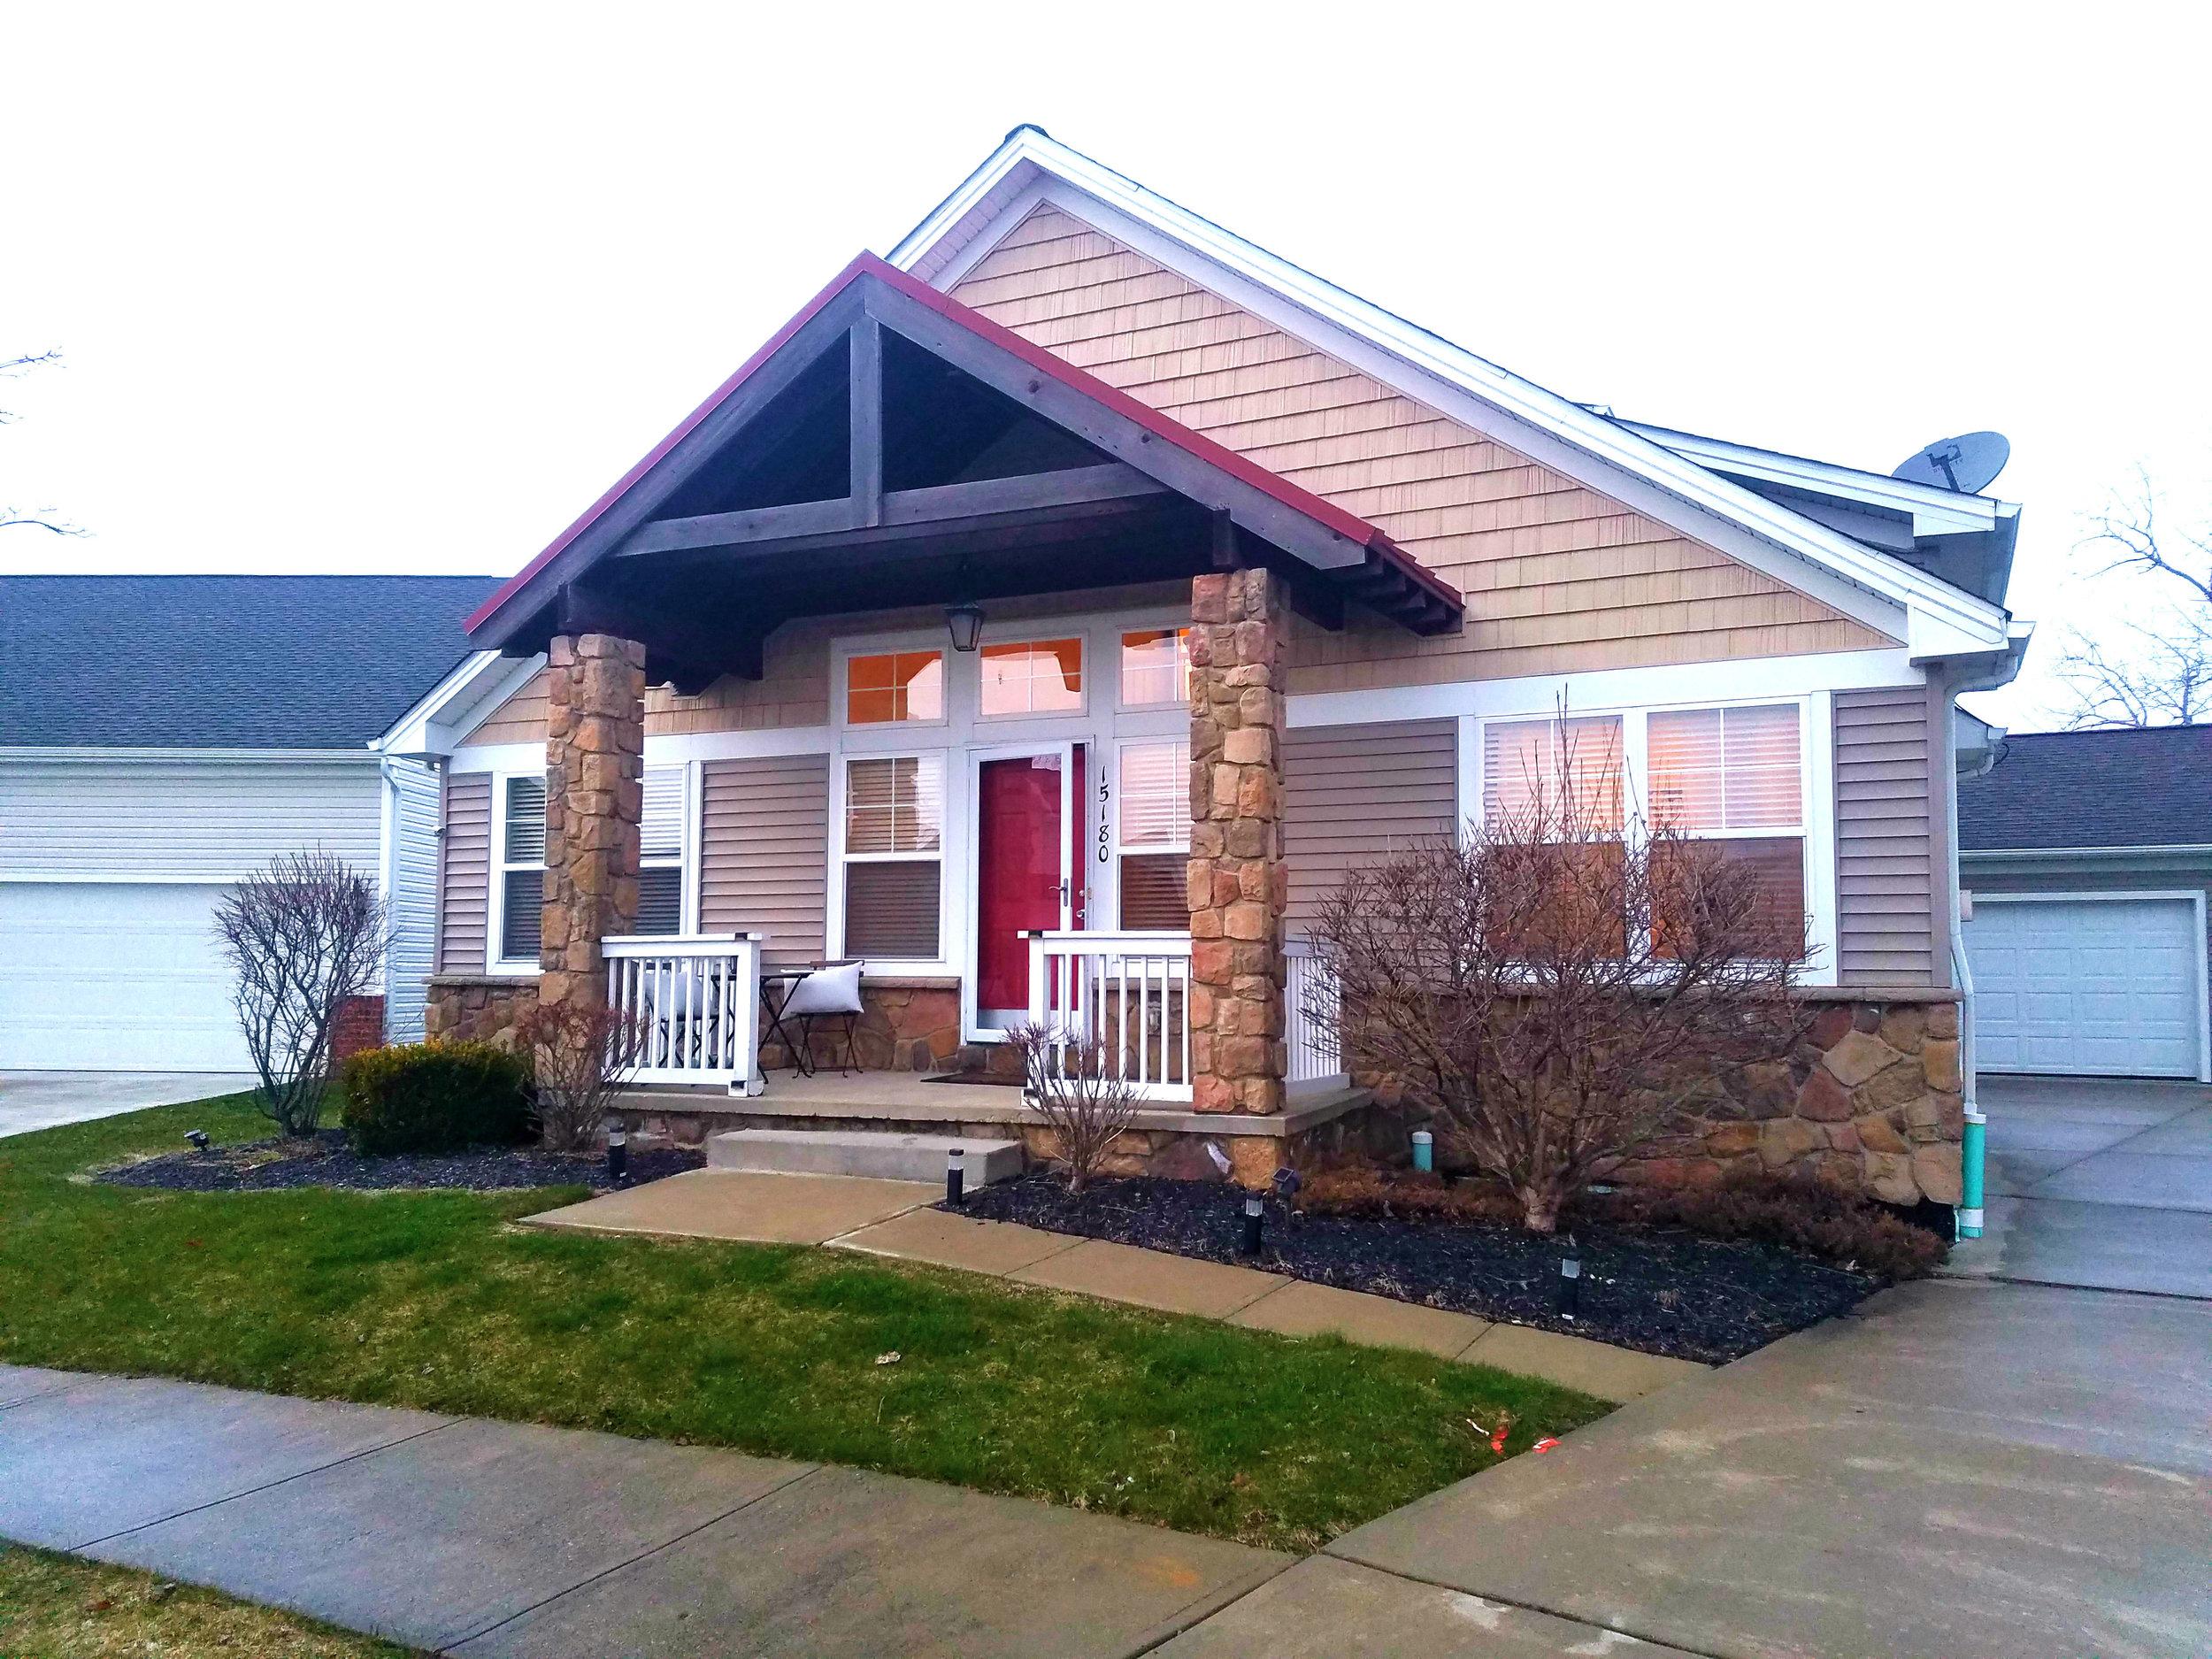 15180 Oneal Pt., Warrensville Hts. | 3 bed 2 bath | 1,836 Sq. Ft. | $185,000